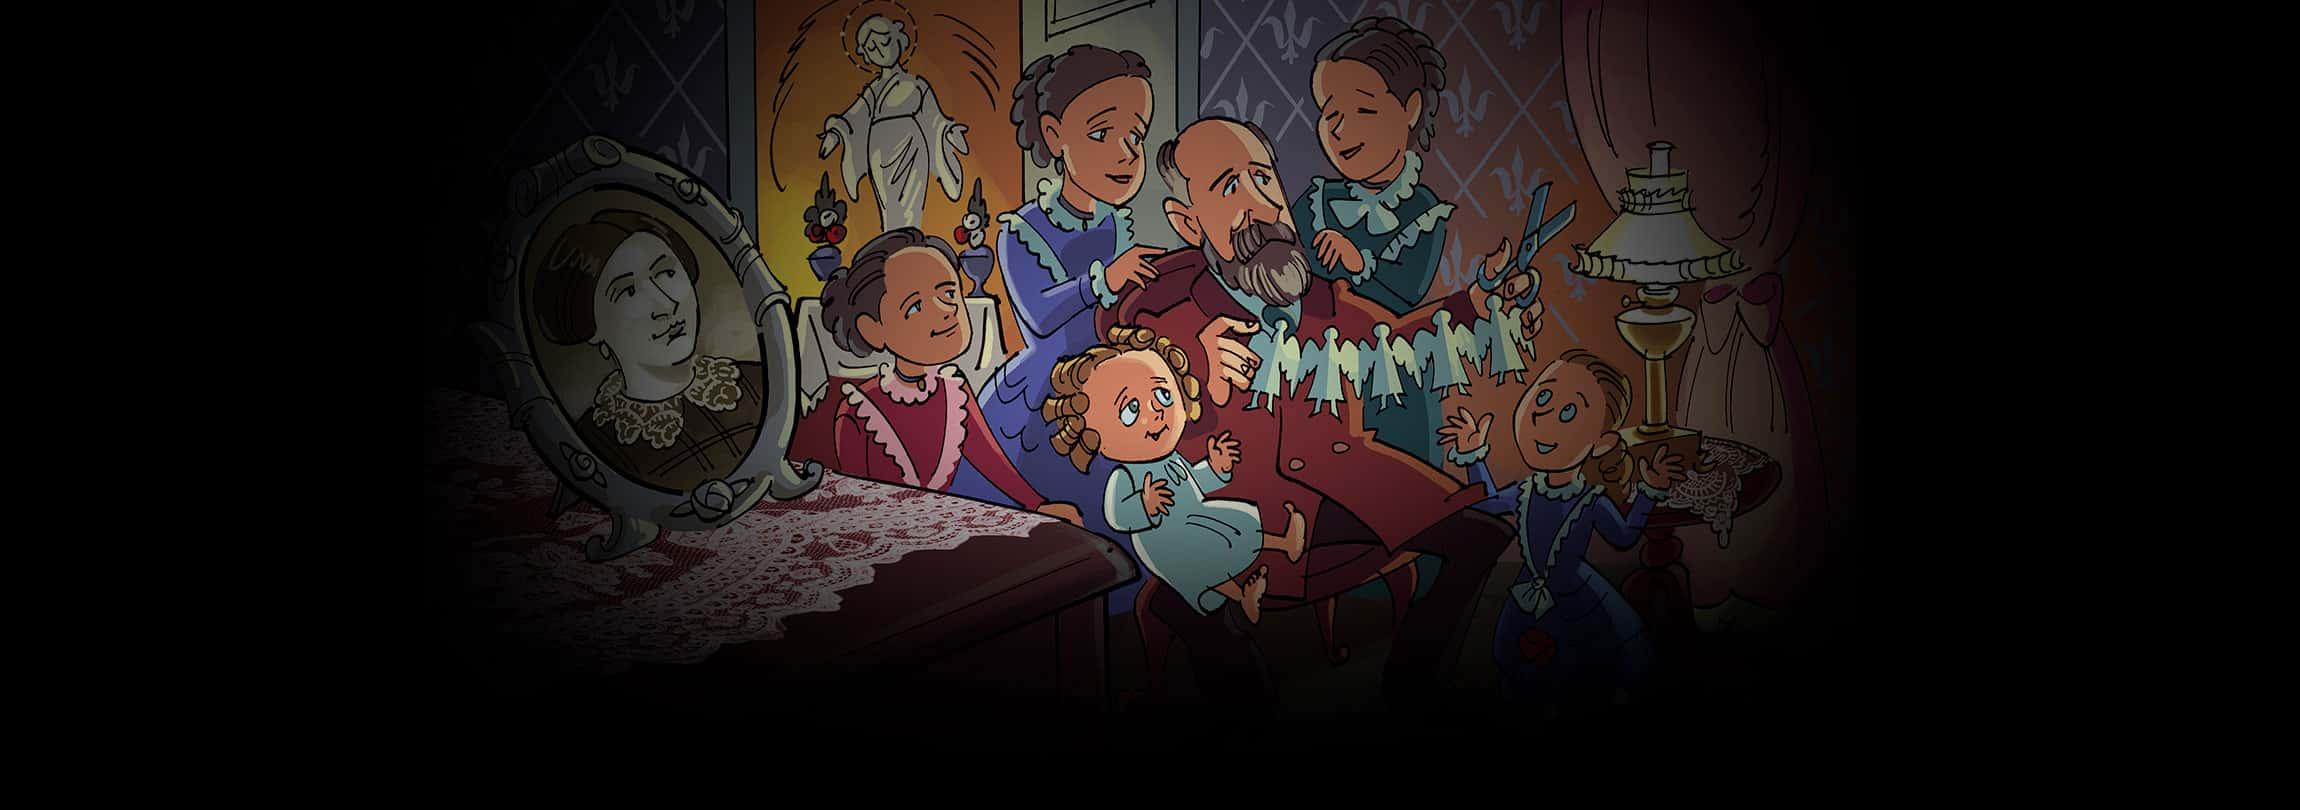 "Luís Martin, o ""pai incomparável"" de Santa Teresinha"